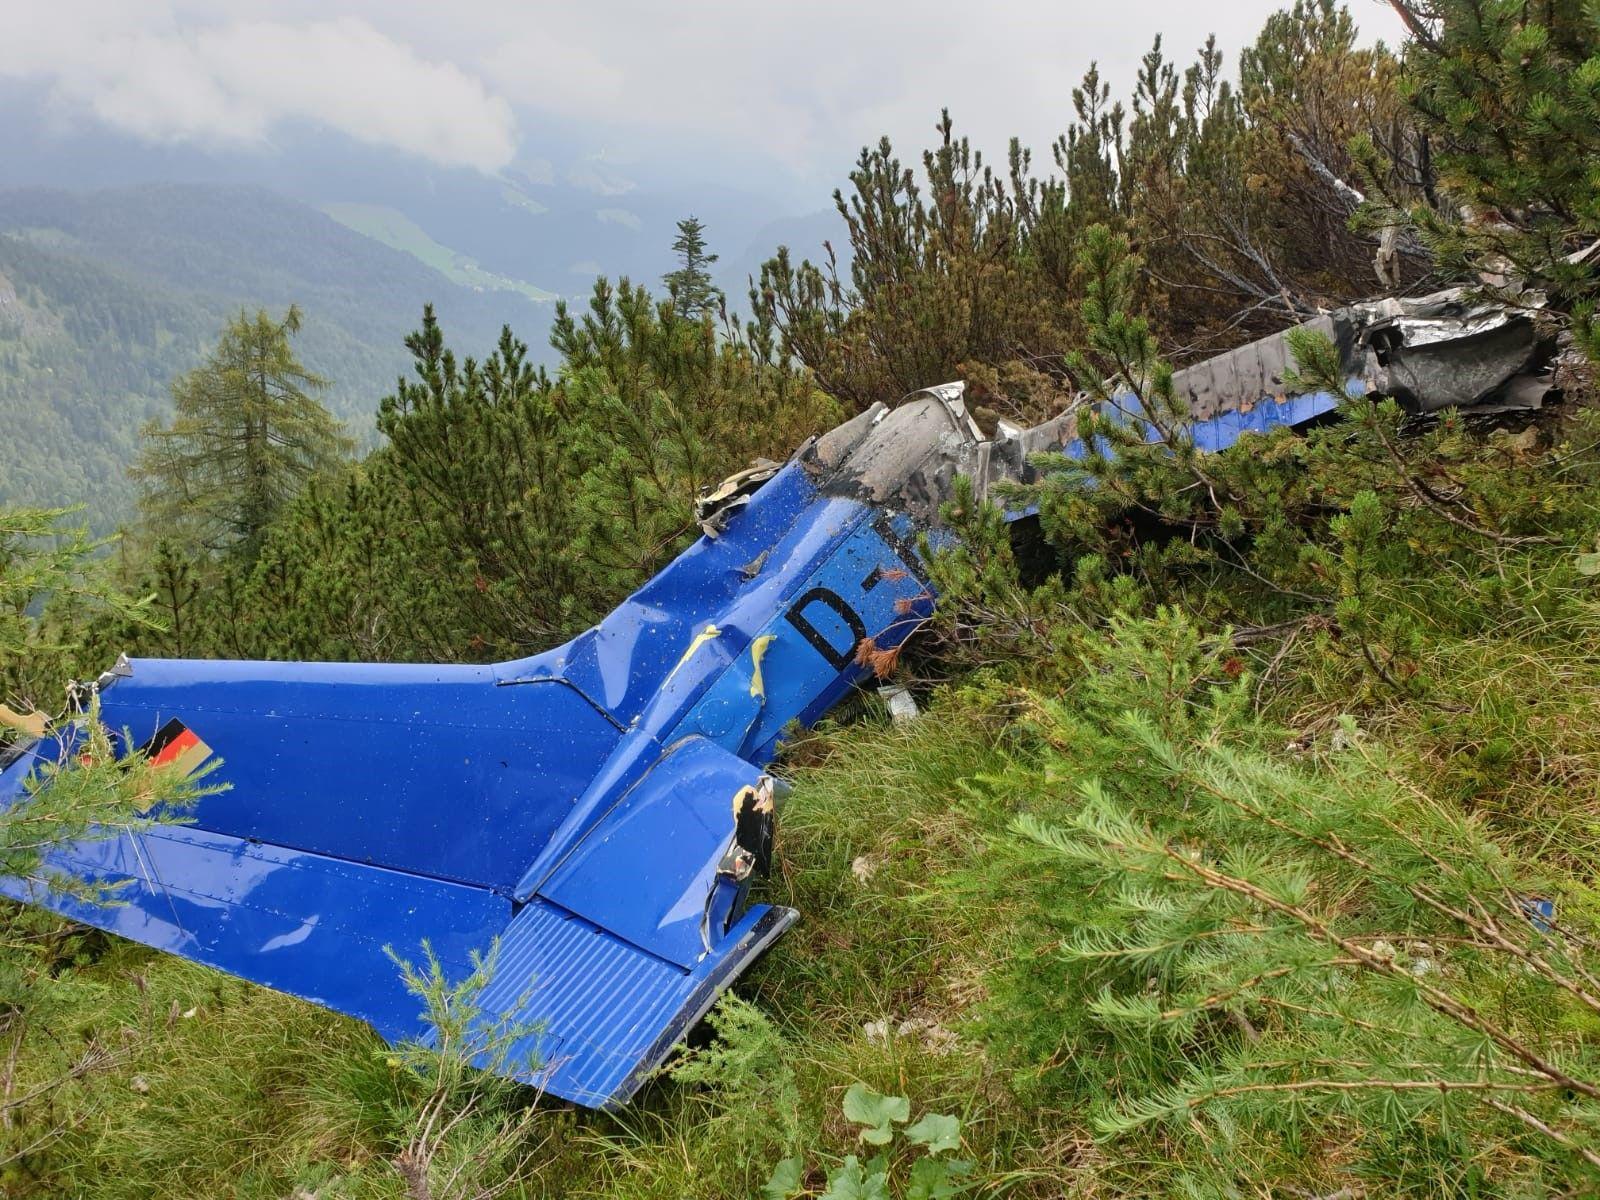 Kleinflugzeug Absturz Bayern